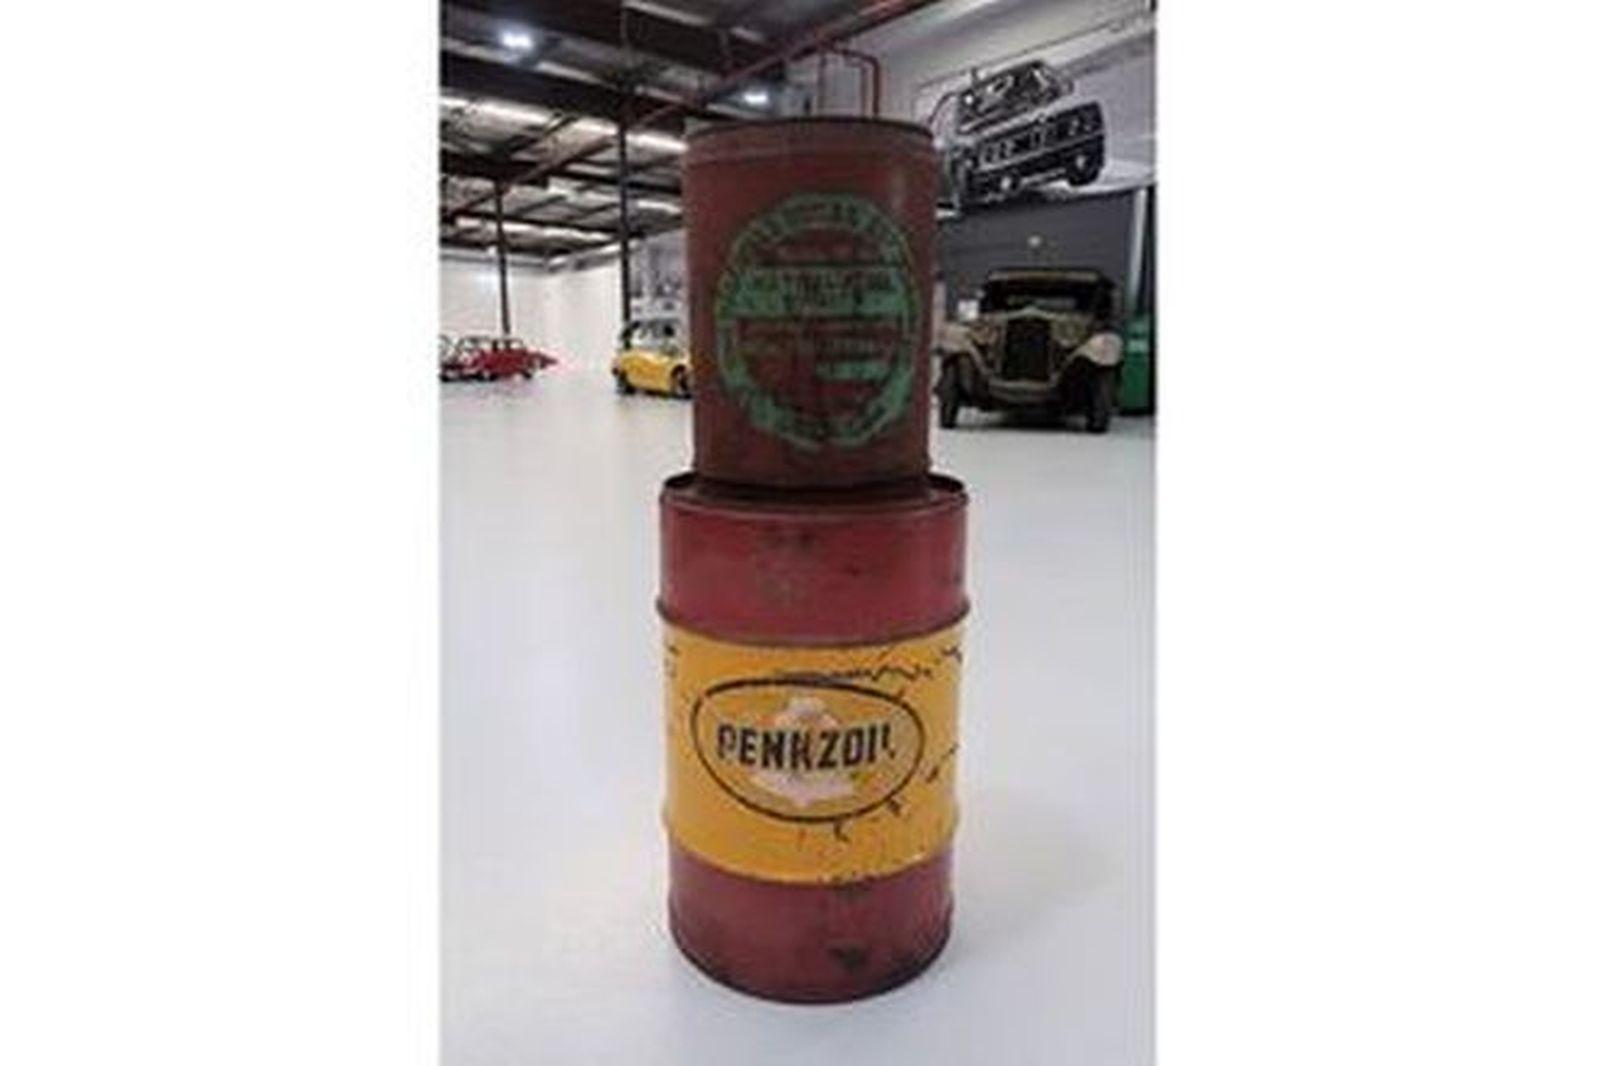 Drums x 2 - CSR Metholated Spirit & Pennzoil 20 litre